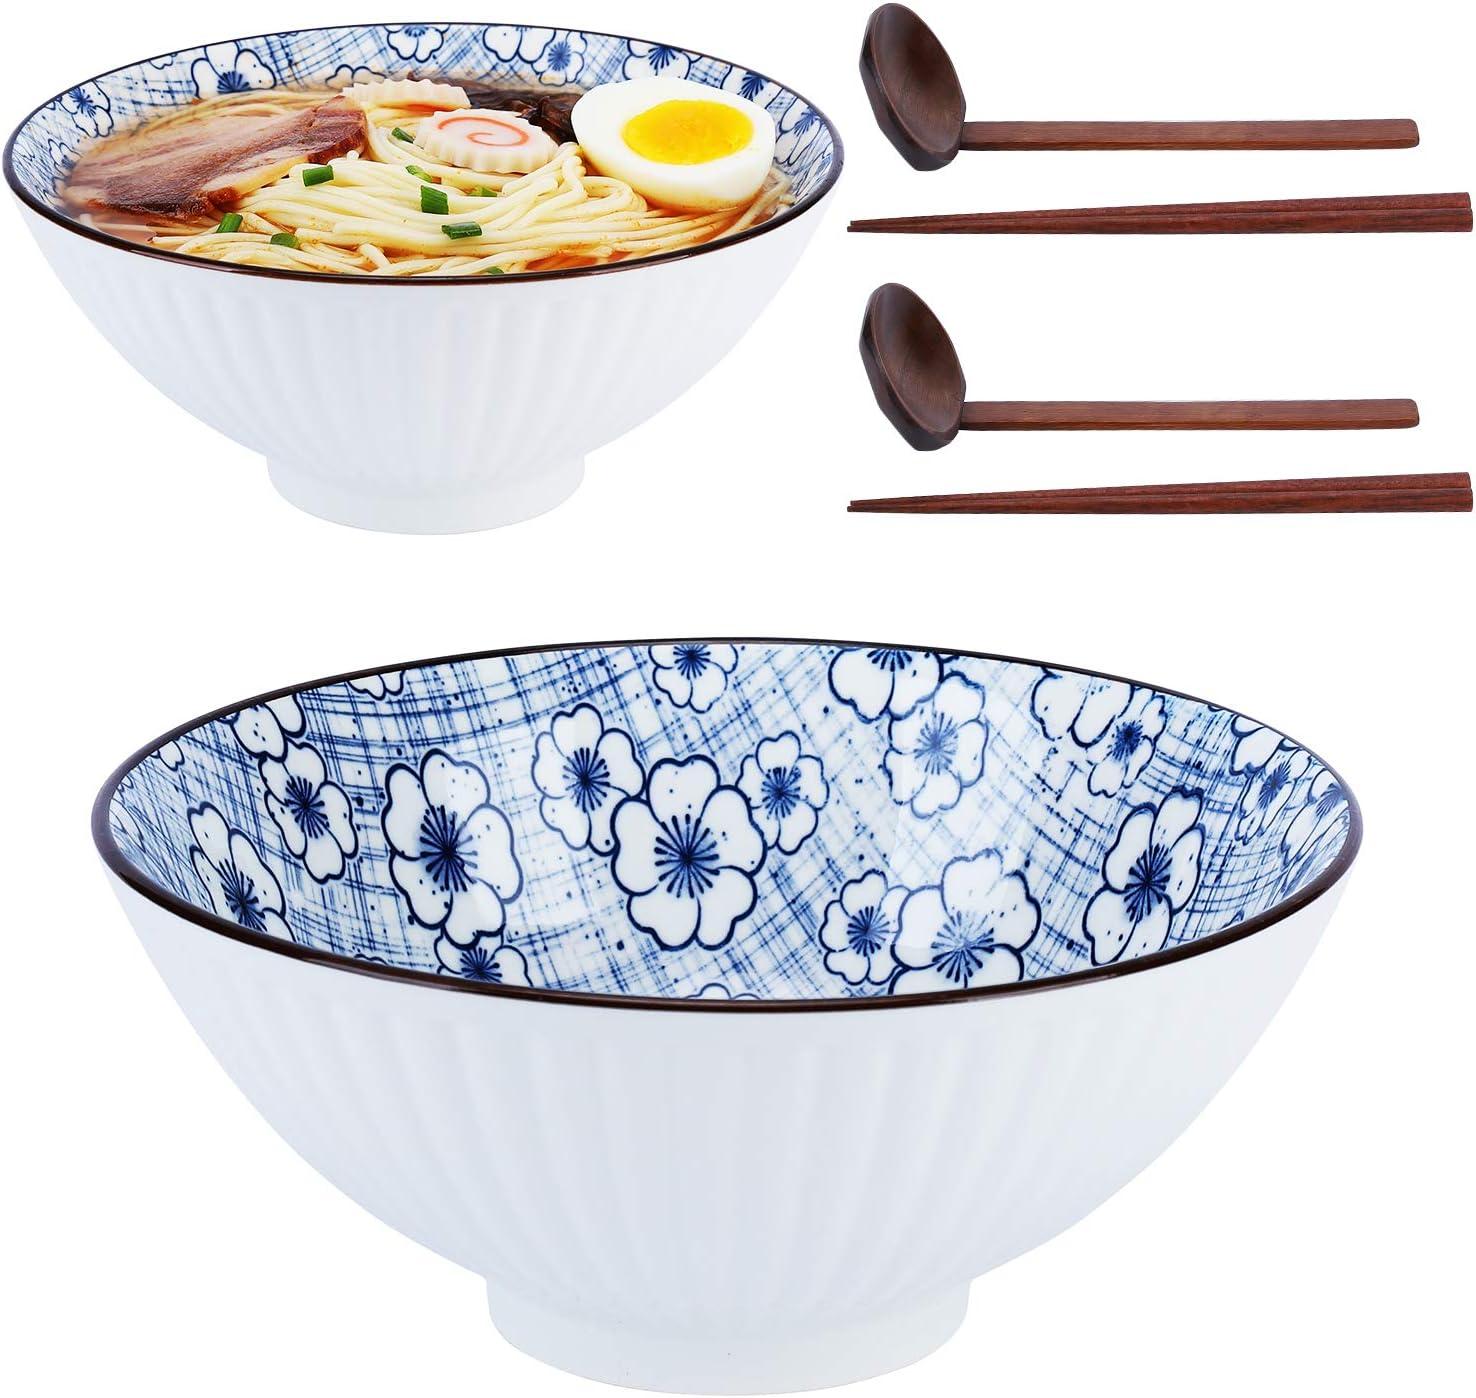 NJCharms Japanese Ceramic Ramen Noodle Bowls 2 Sales Cash special price results No. 1 4 Sets Piece 6